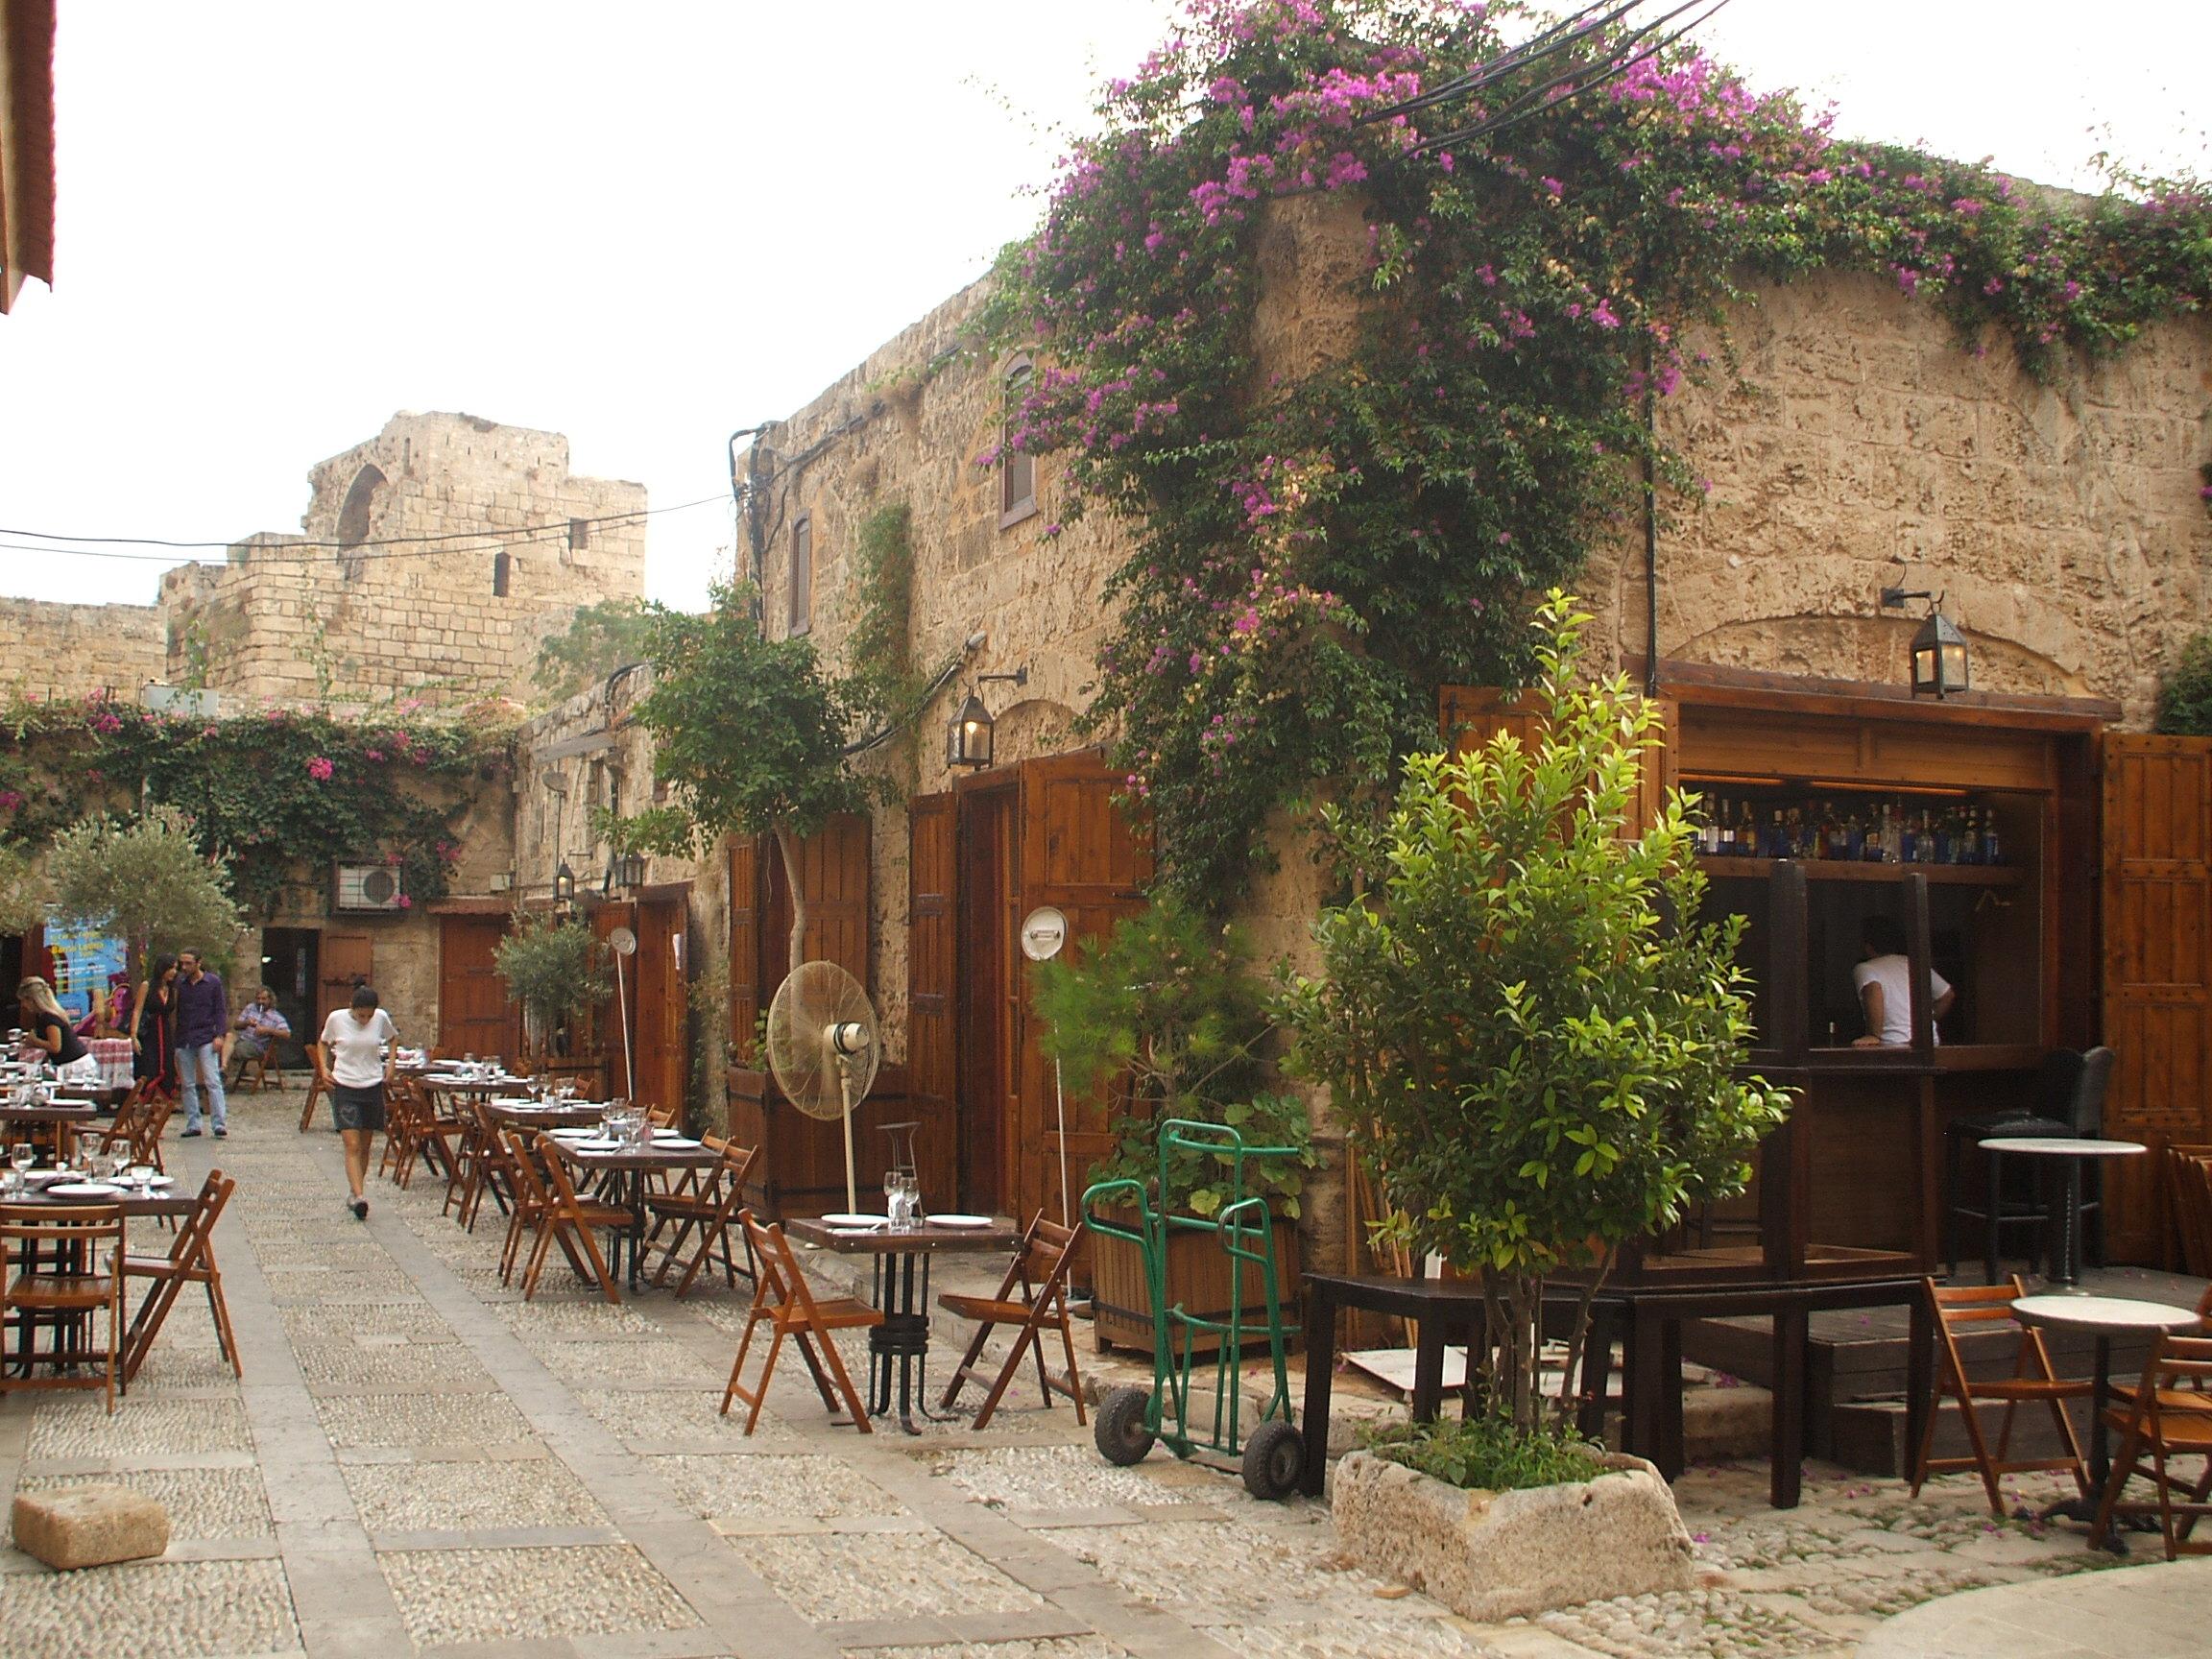 Restaurants Libanais Al Dar Proches Rue M Ef Bf Bdzi Ef Bf Bdre Paris